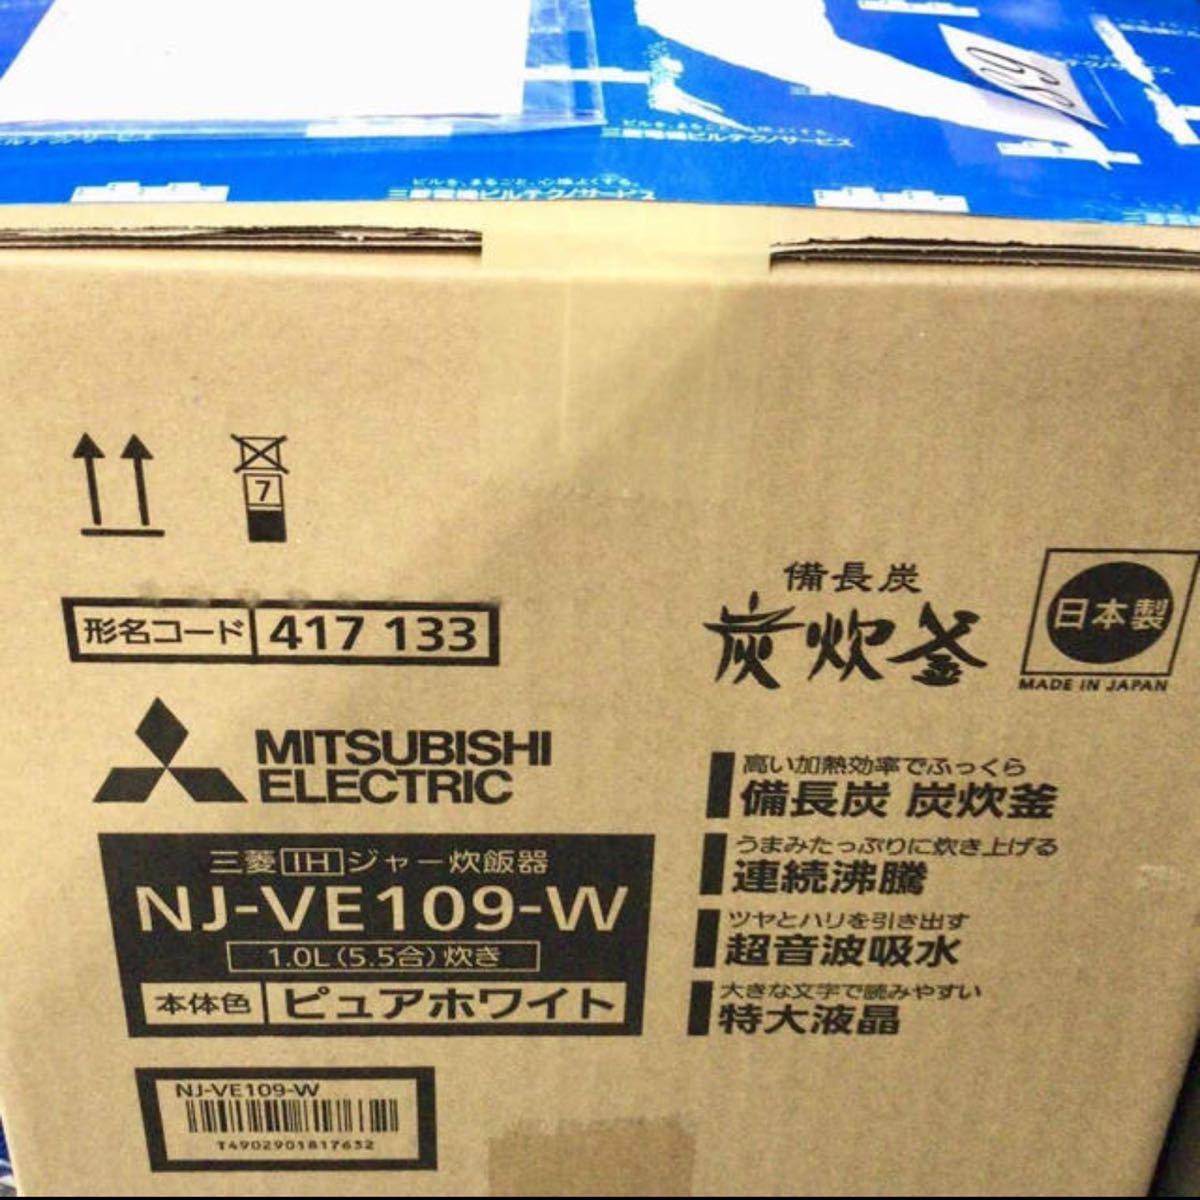 【新品未開封】三菱 備長炭 炭炊釜 NJ-VE109 IHジャー炊飯器 5.5合 白  MITSUBISHI